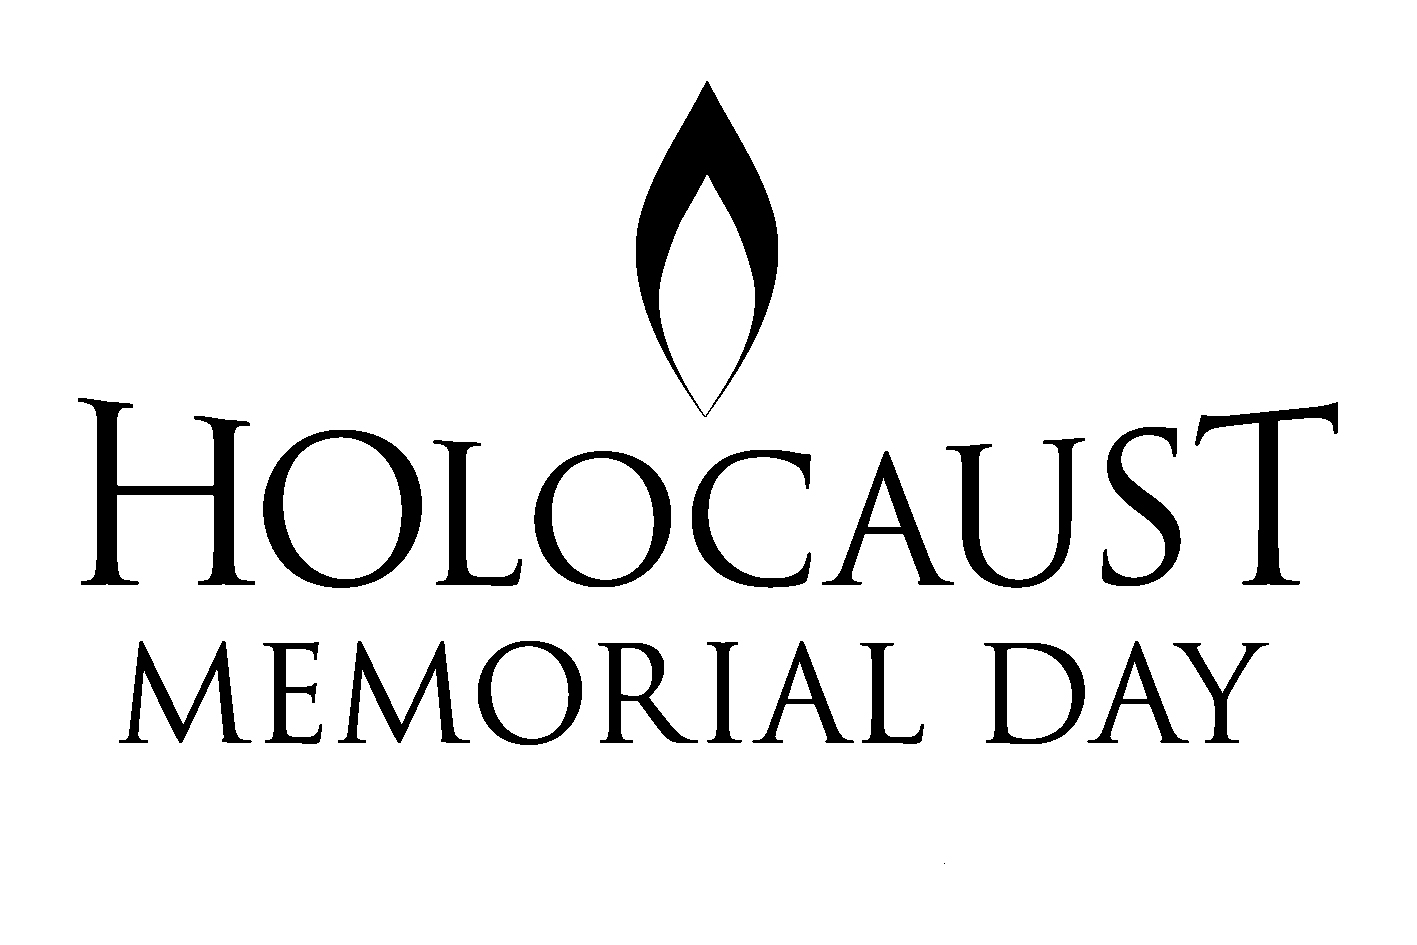 Holocaust Memoridal day